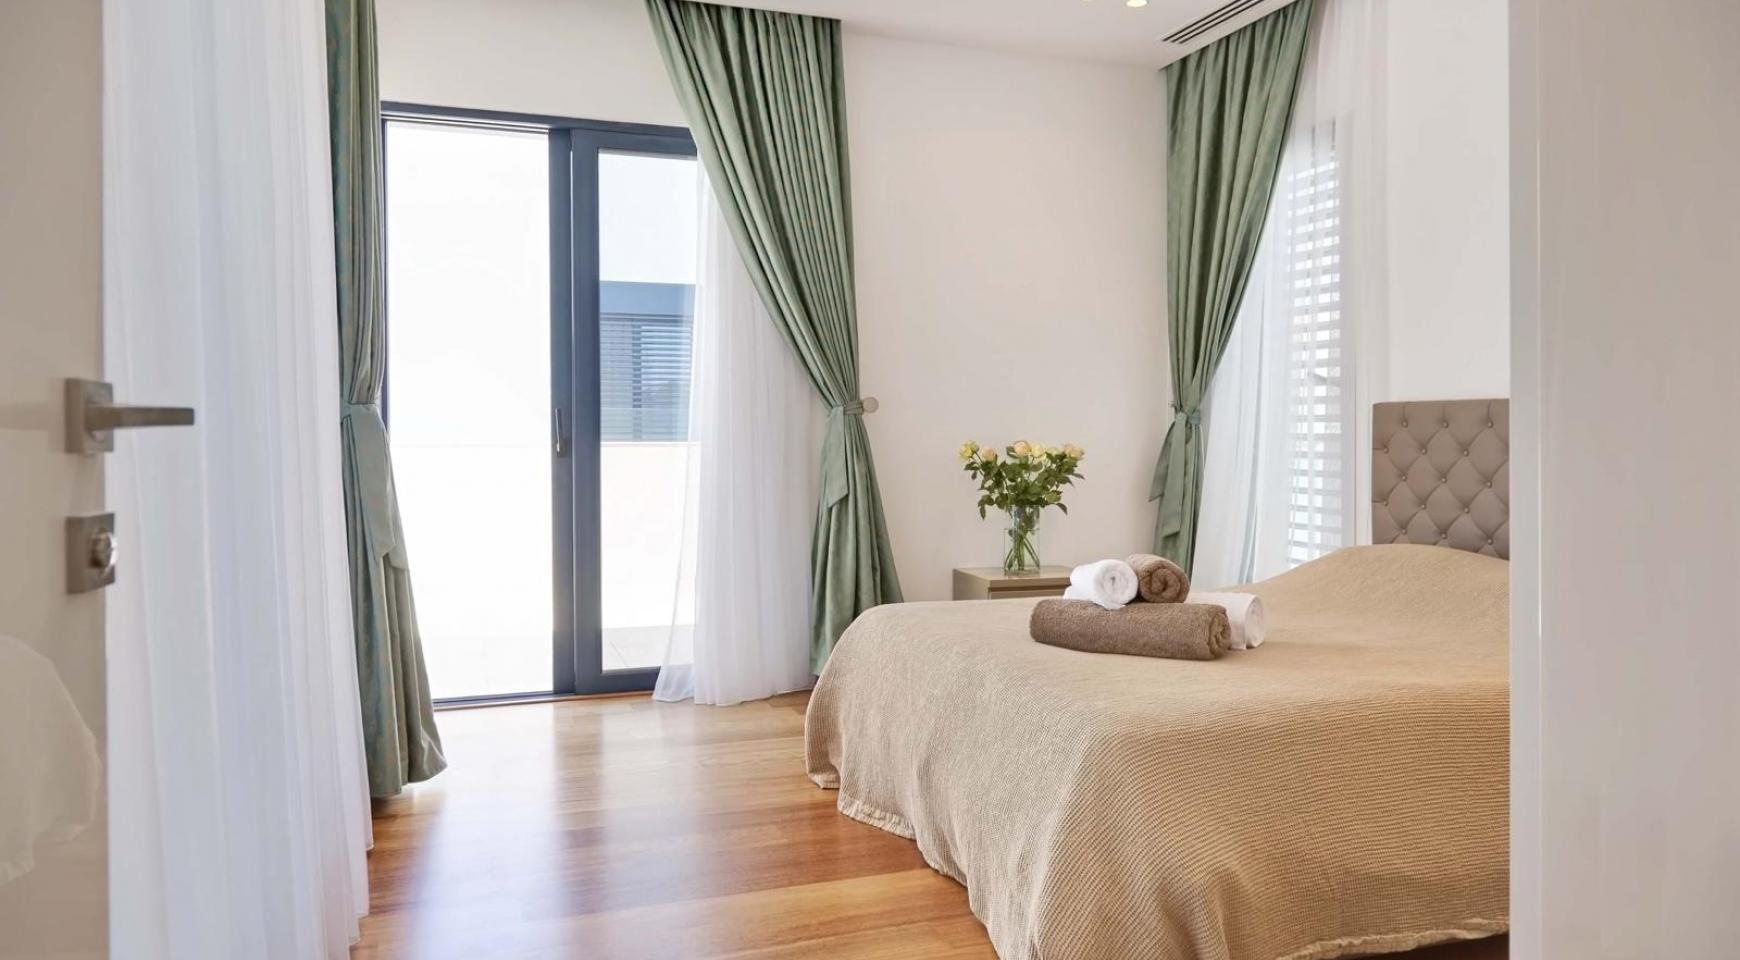 New Luxurious 4 Bedroom Villa in the Tourist Area - 34